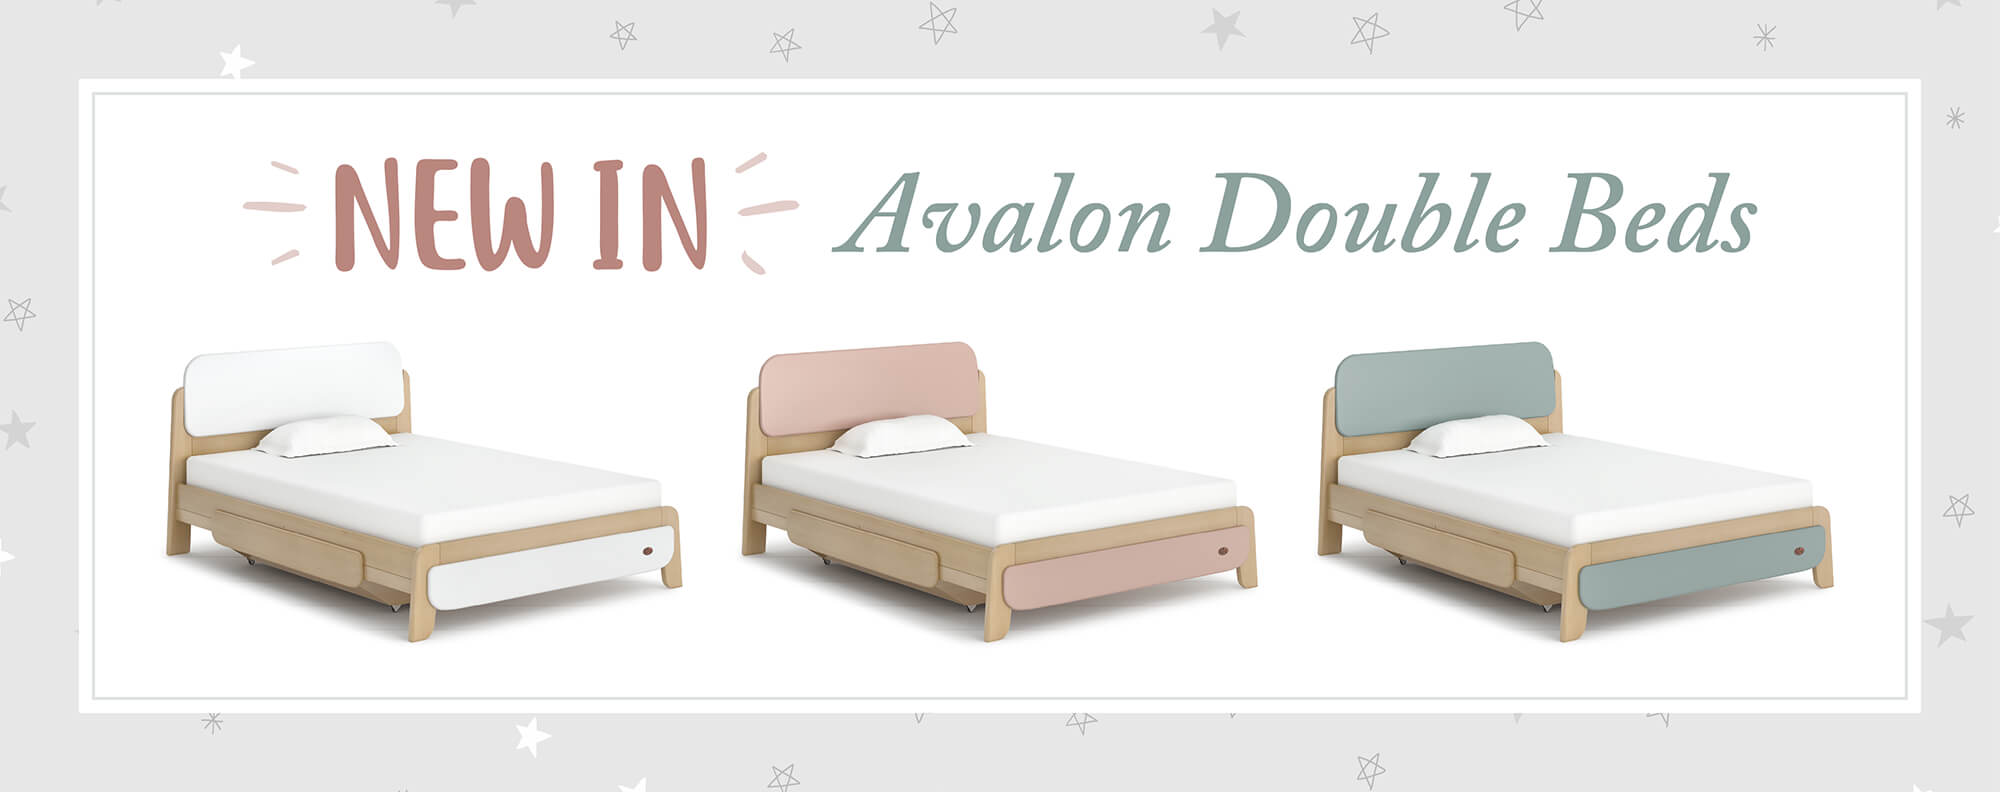 AU_Avalon_Website_Artwork_Mobile_Category_Banner_2000_x_700_July_2021__2x